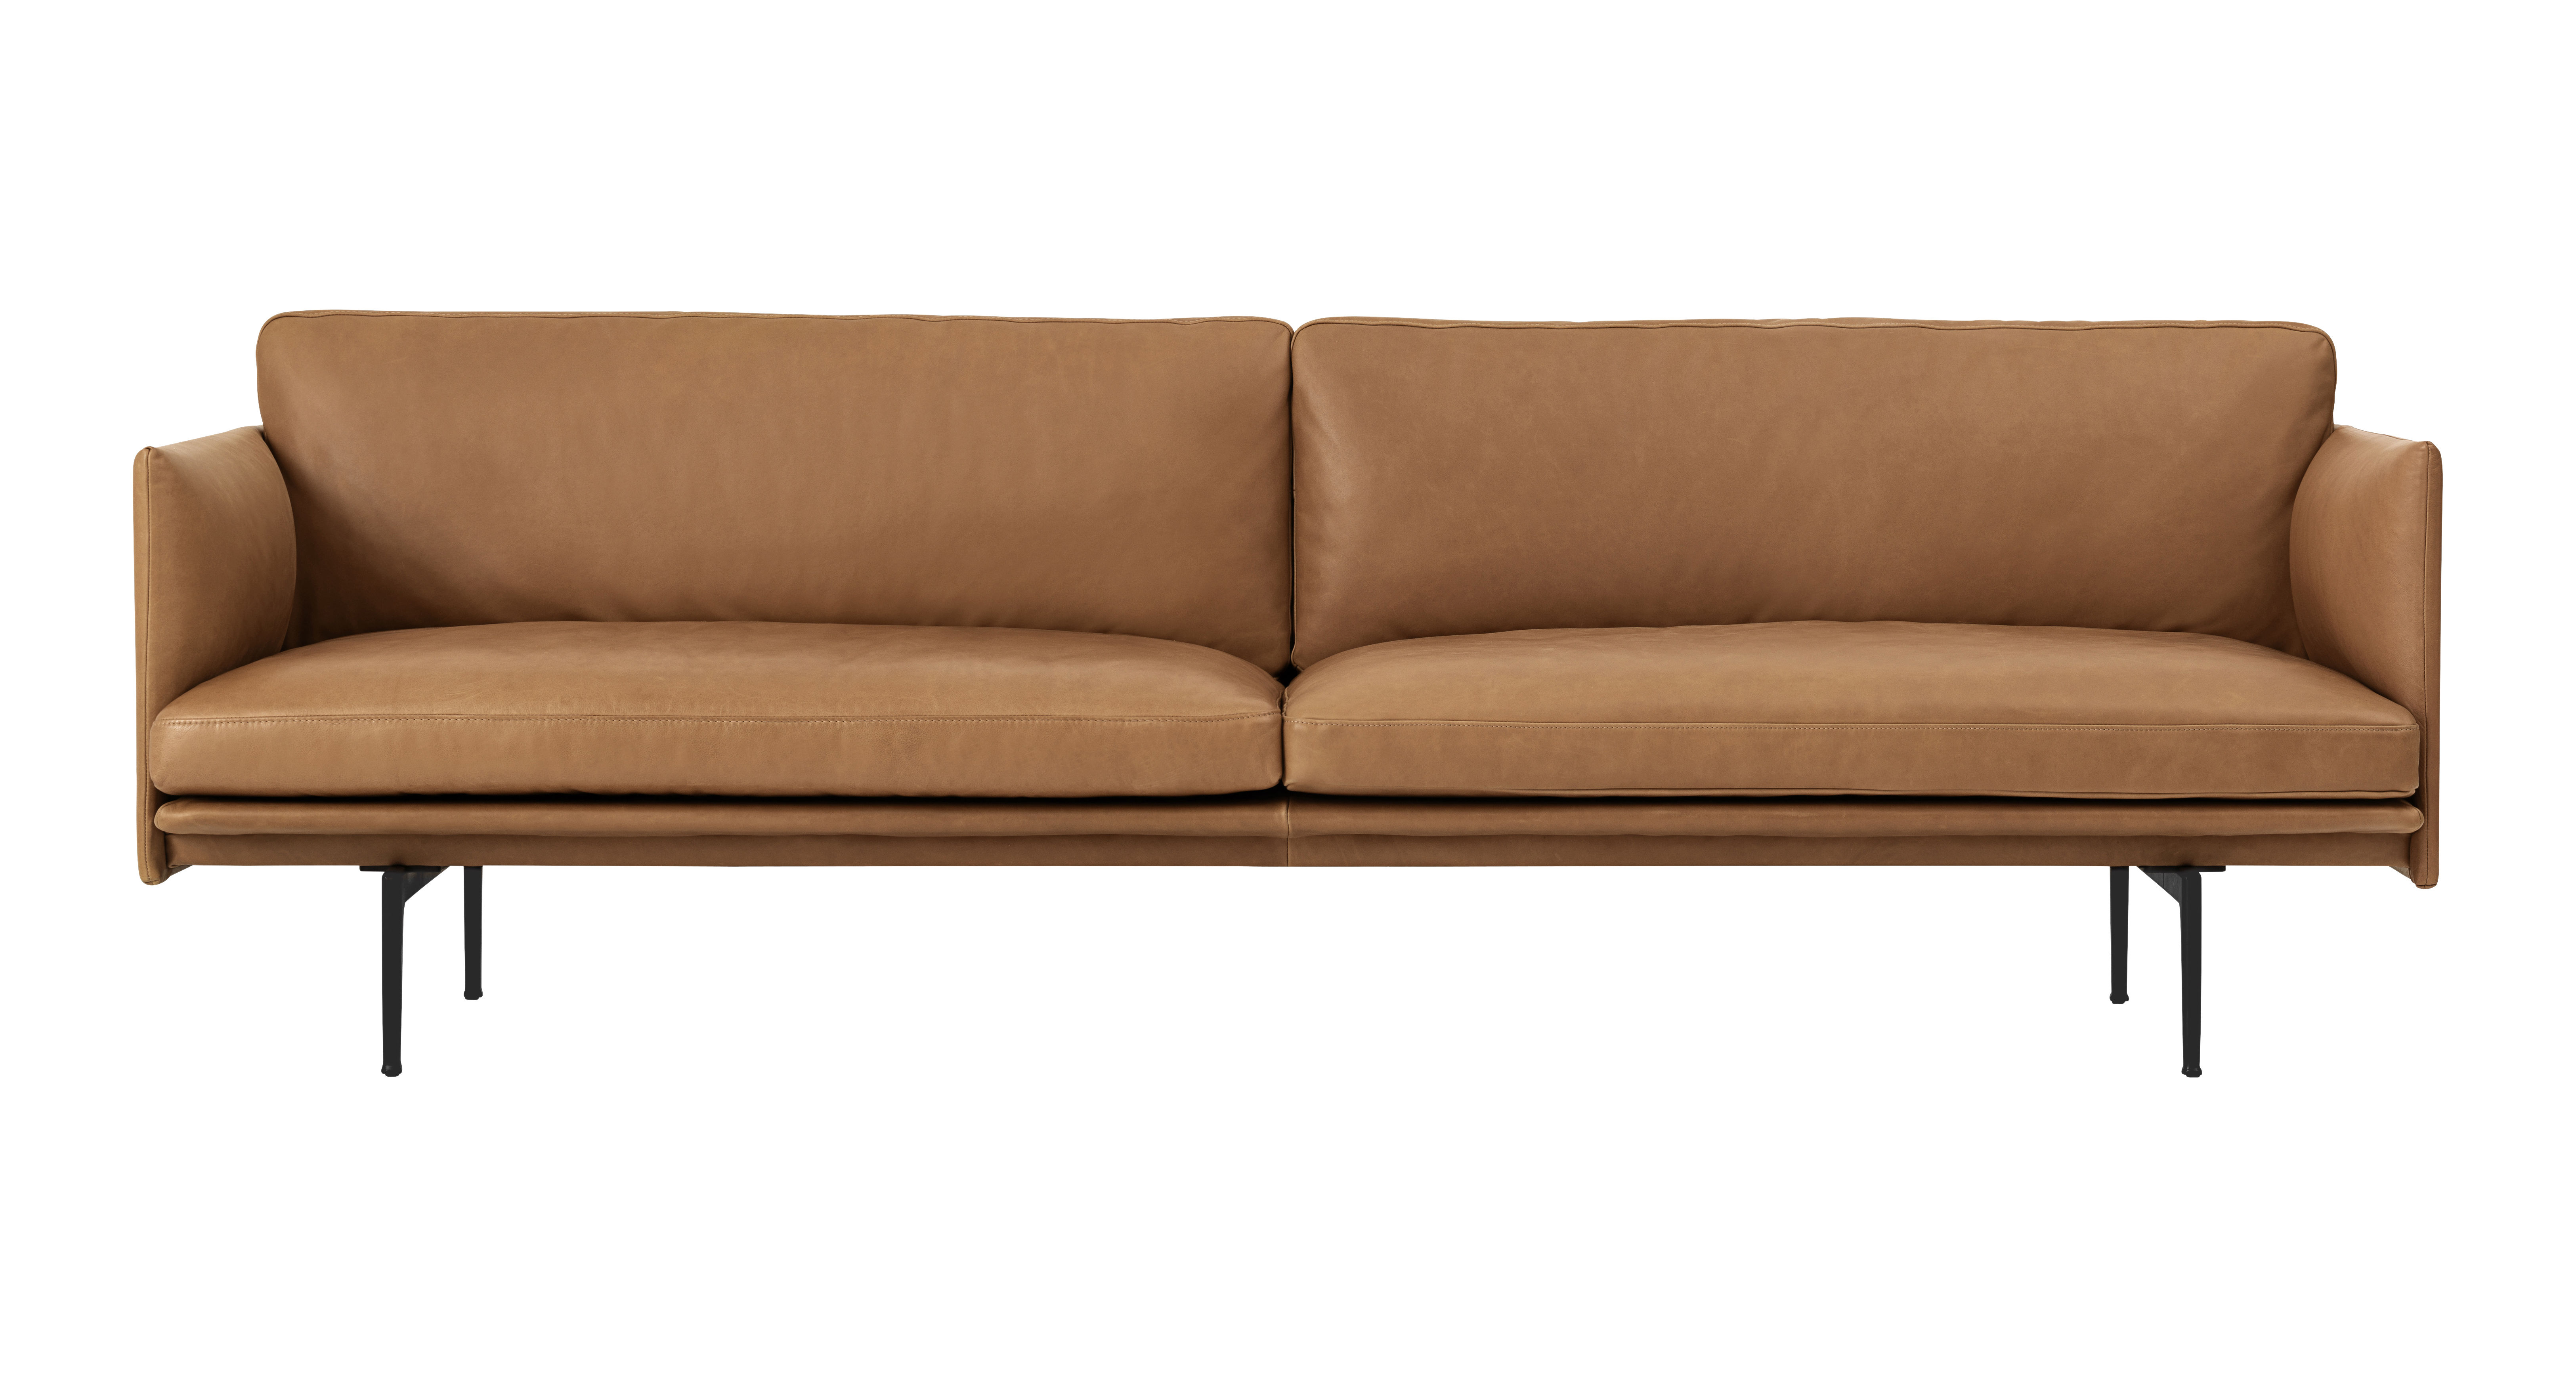 Möbel - Sofas - Outline Sofa / 3-Sitzer - L 220 cm - Leder - Muuto - Lederbezug cognacfarben / Füße schwarz -  Plumes, Cuir pleine fleur, High Density-Schaum, lackiertes Aluminium